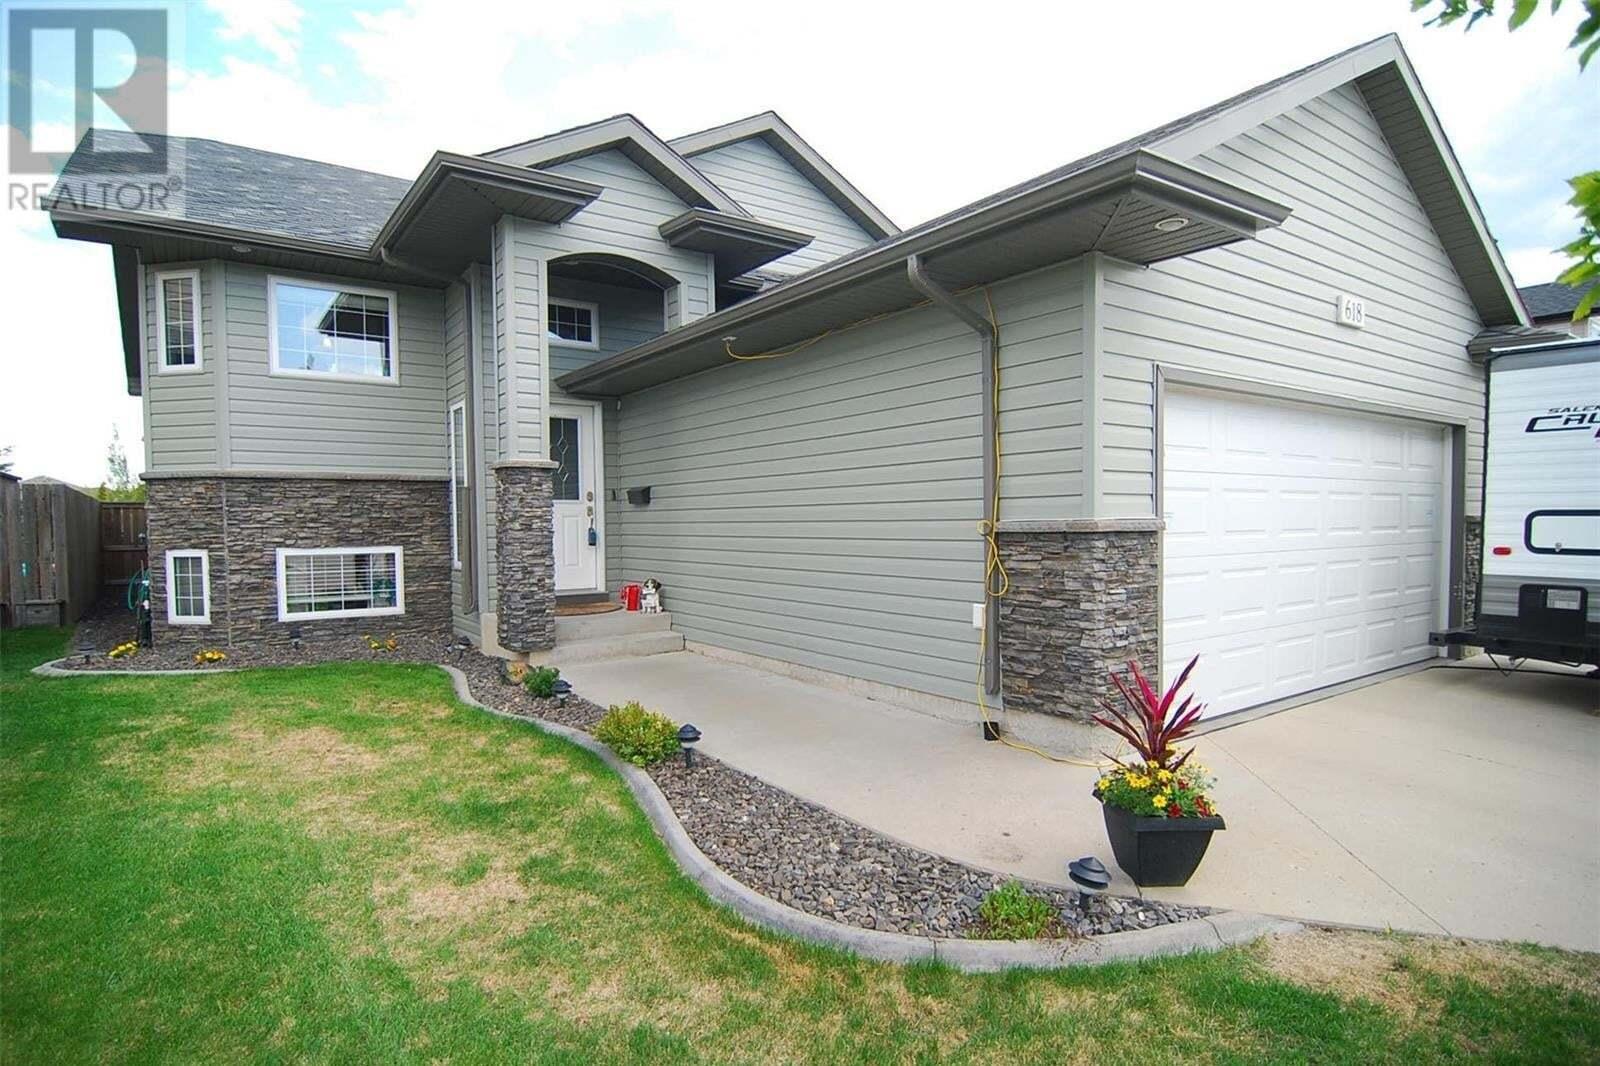 House for sale at 618 Lynd Cres Saskatoon Saskatchewan - MLS: SK810895